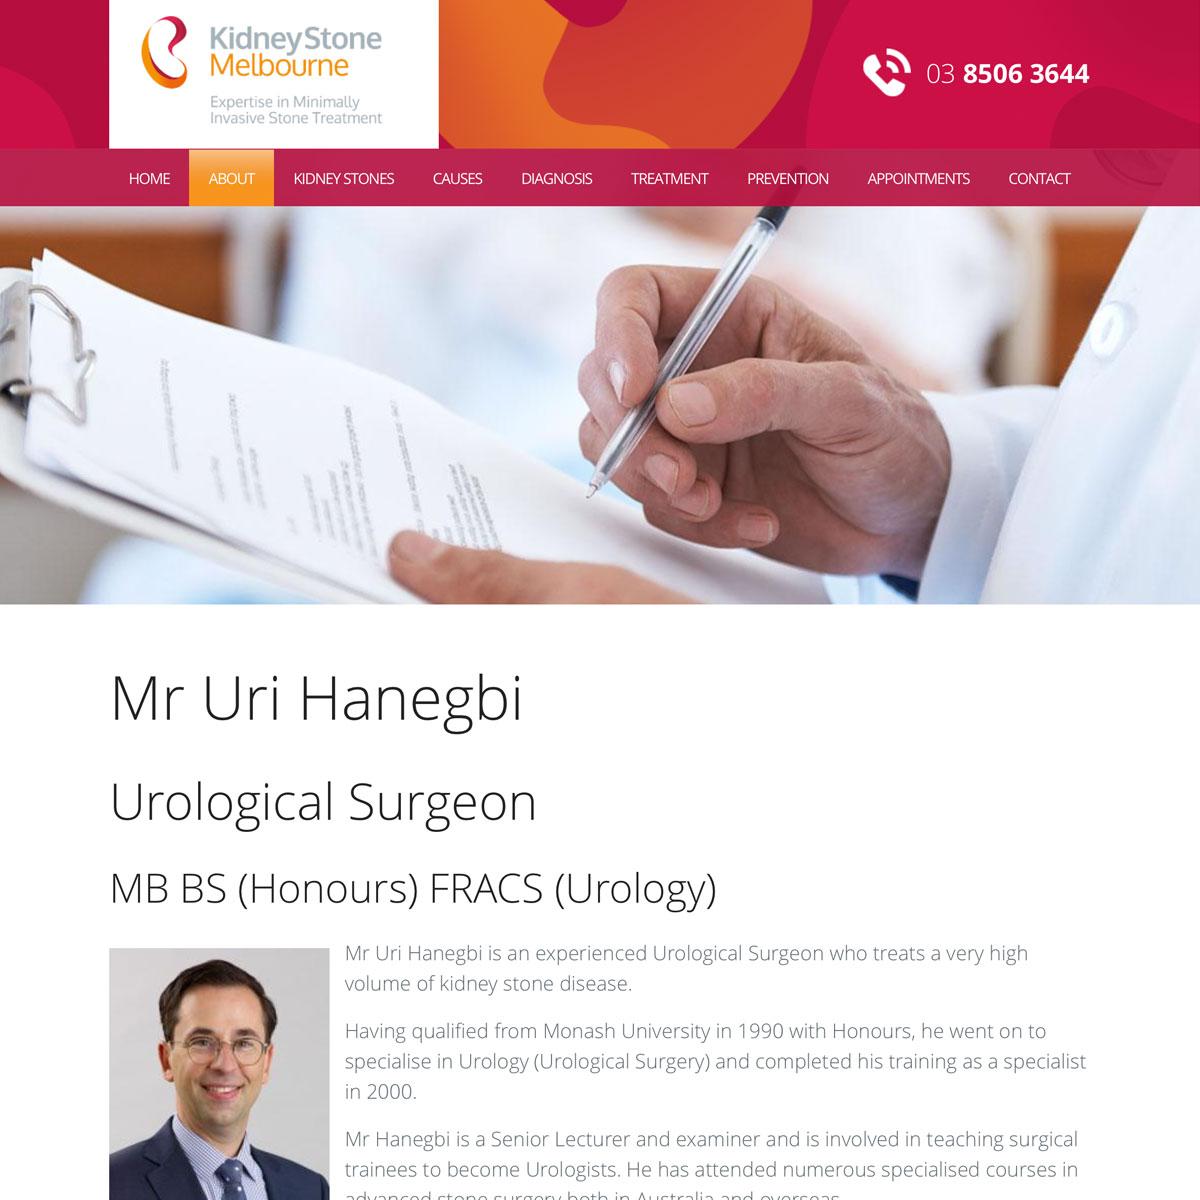 Kidney Stone Melbourne - Mr Uri Hanegbi